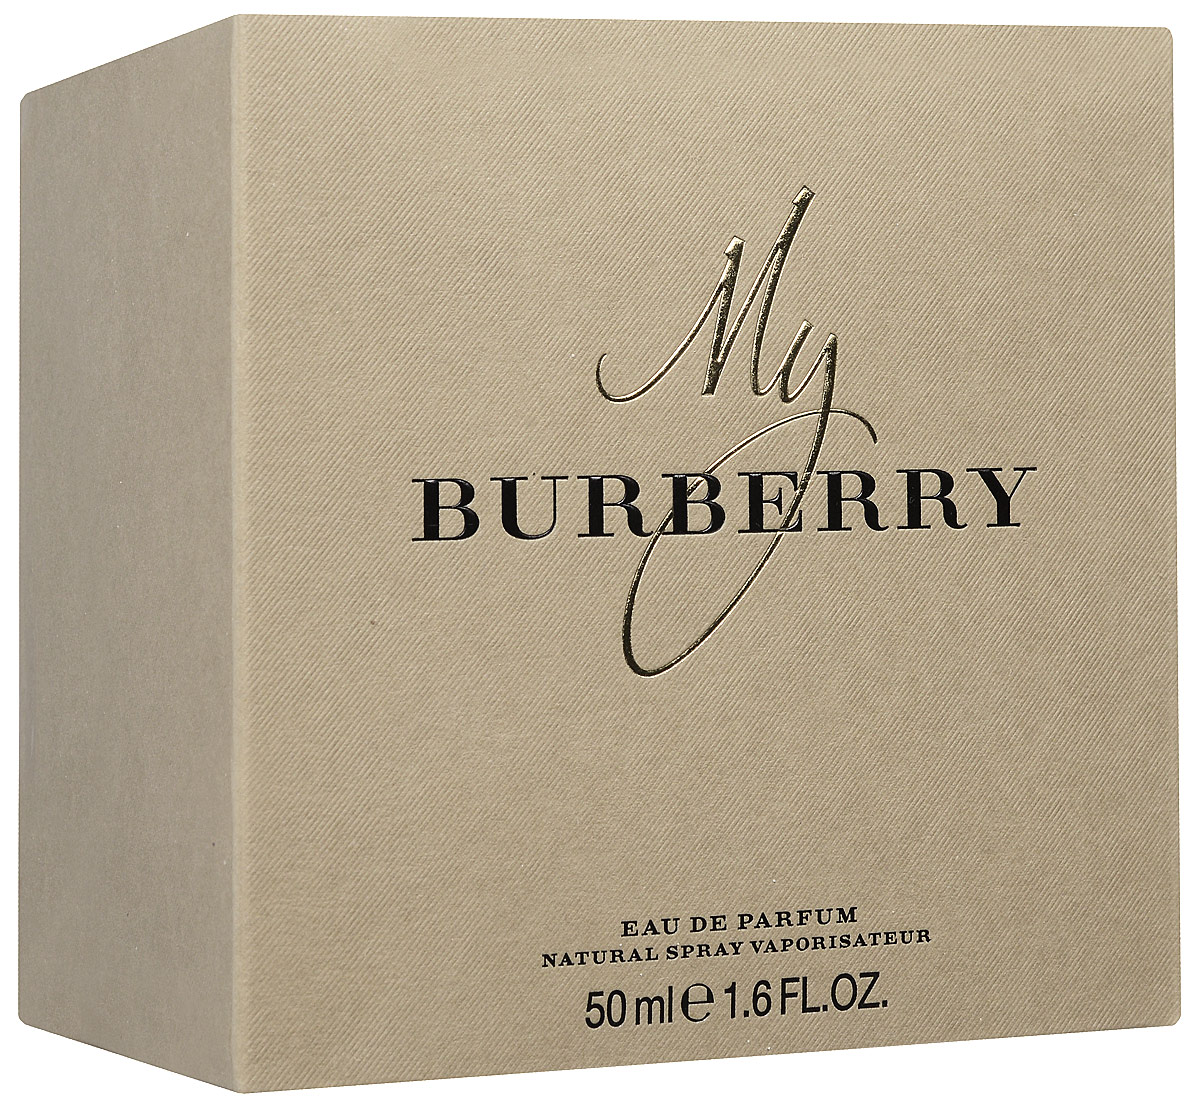 BURBERRY MY BURBERRY WOMAN парфюмированная вода 50МЛ цена